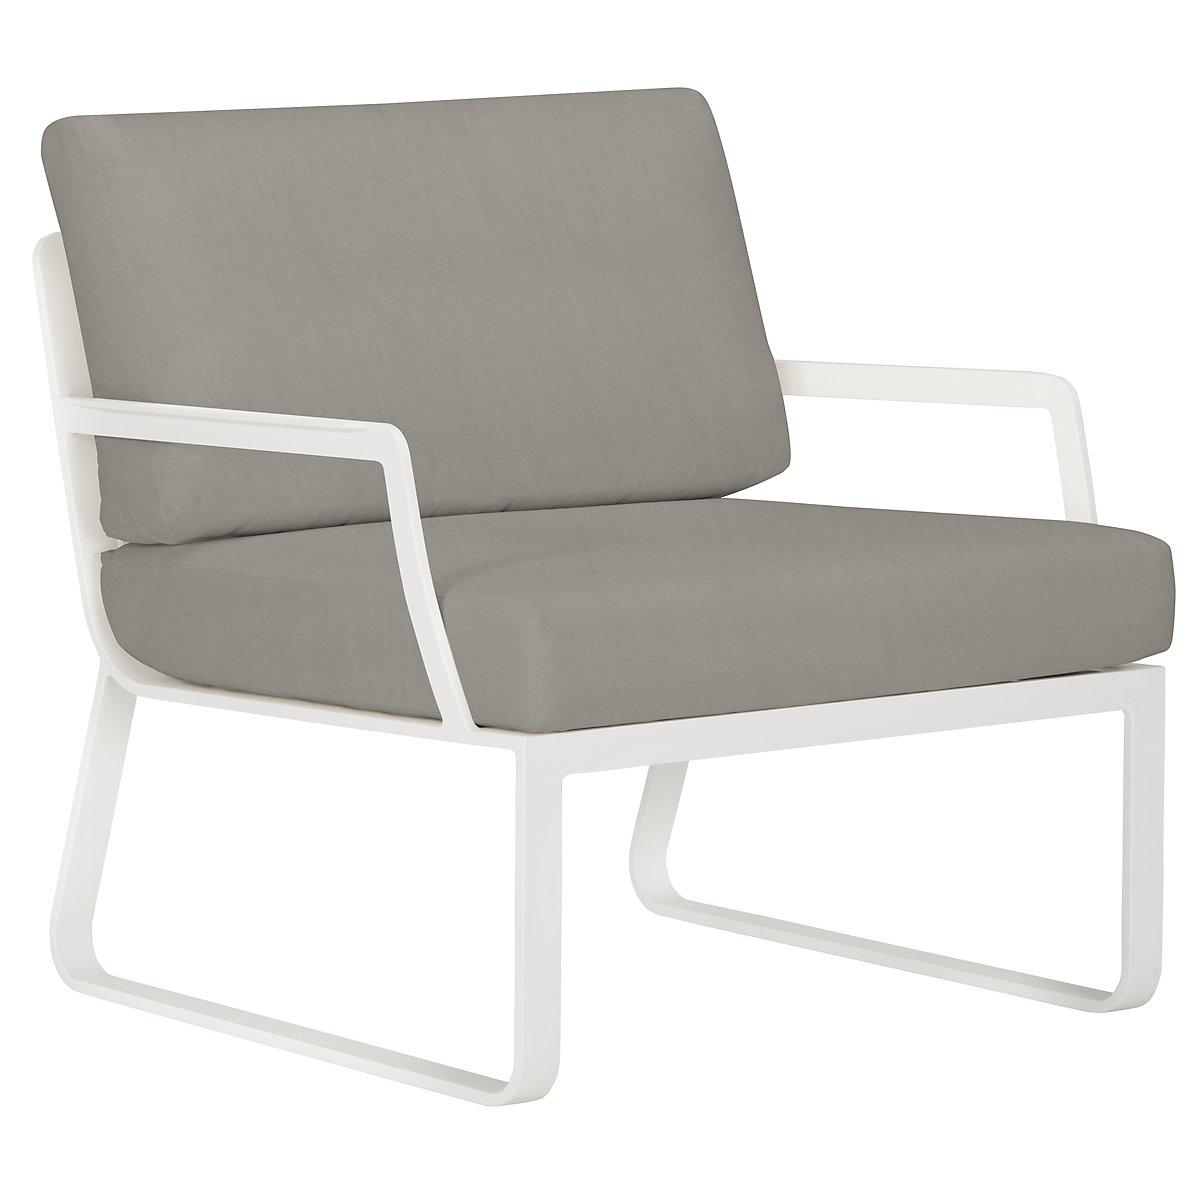 Outdoor Living Room Sets City Furniture Ibiza Gray Outdoor Living Room Set